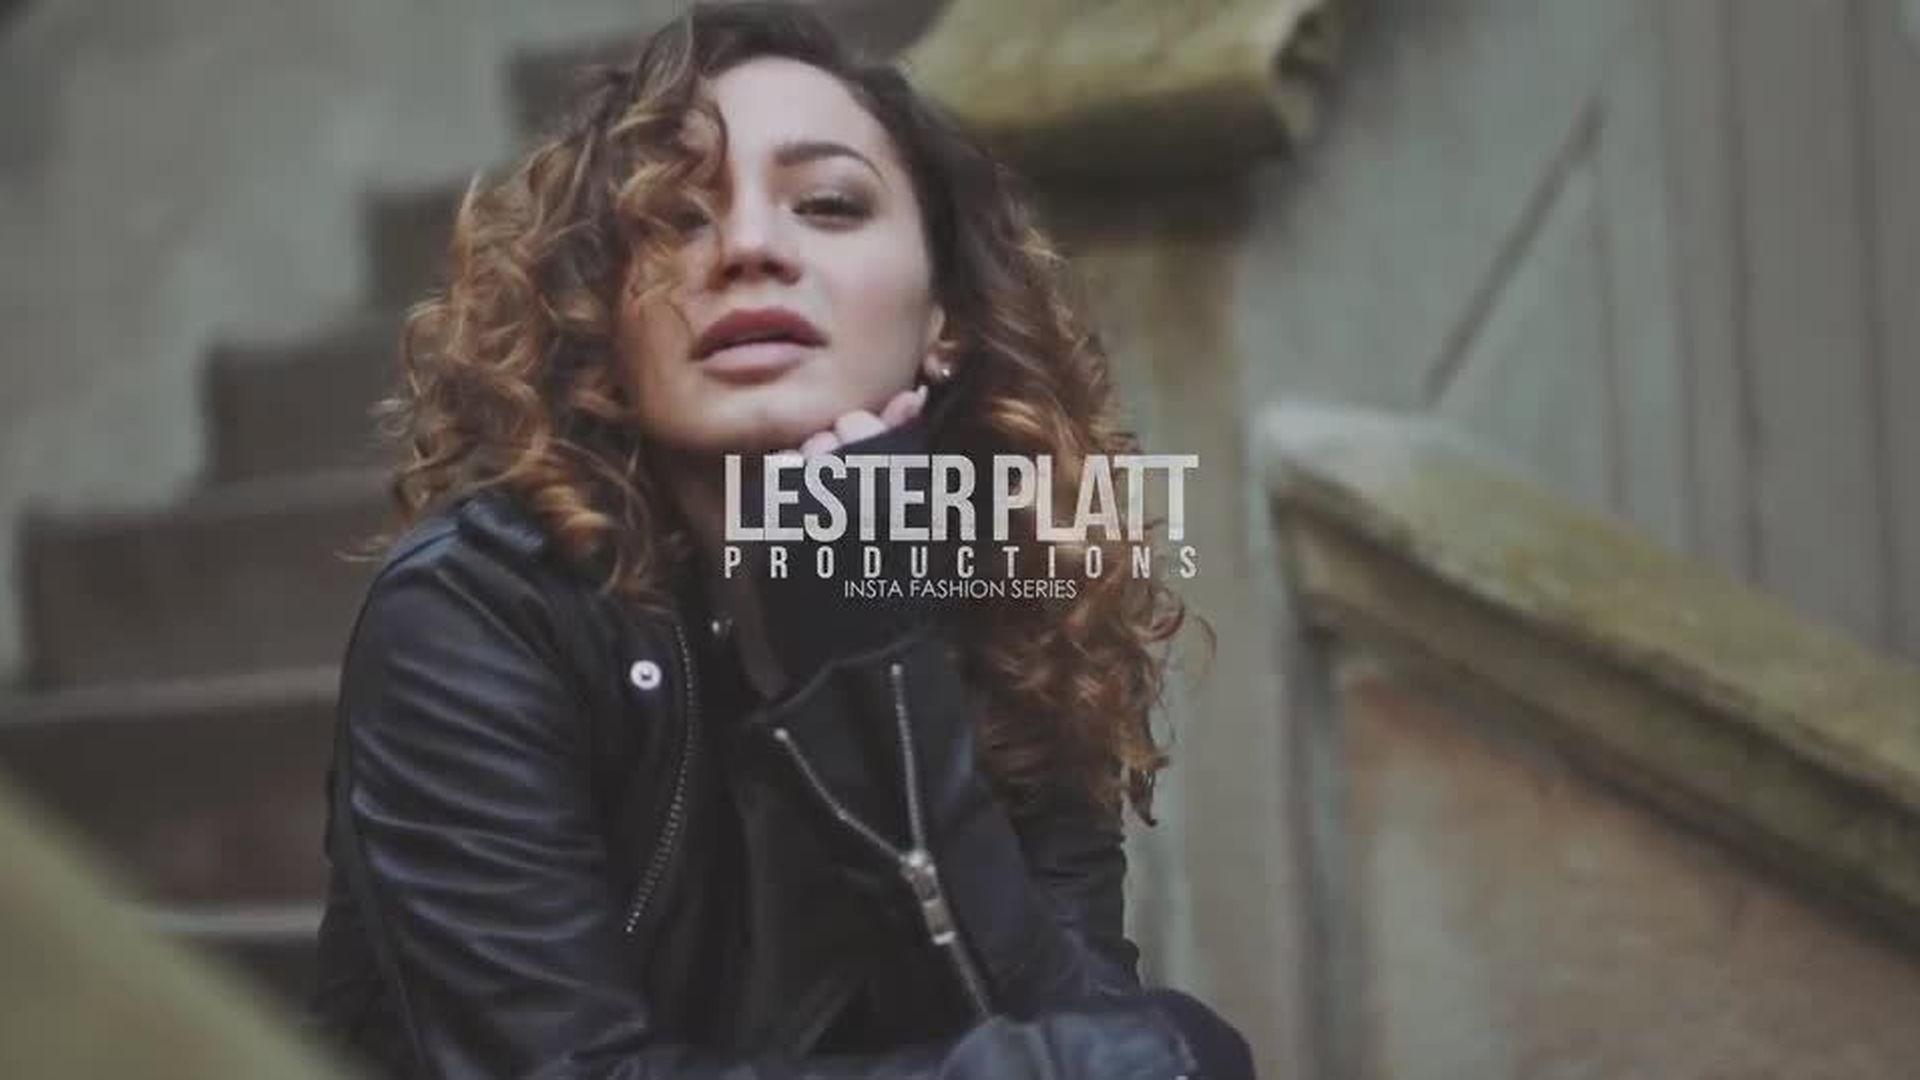 Chetti-Fashion Film By Lester Platt